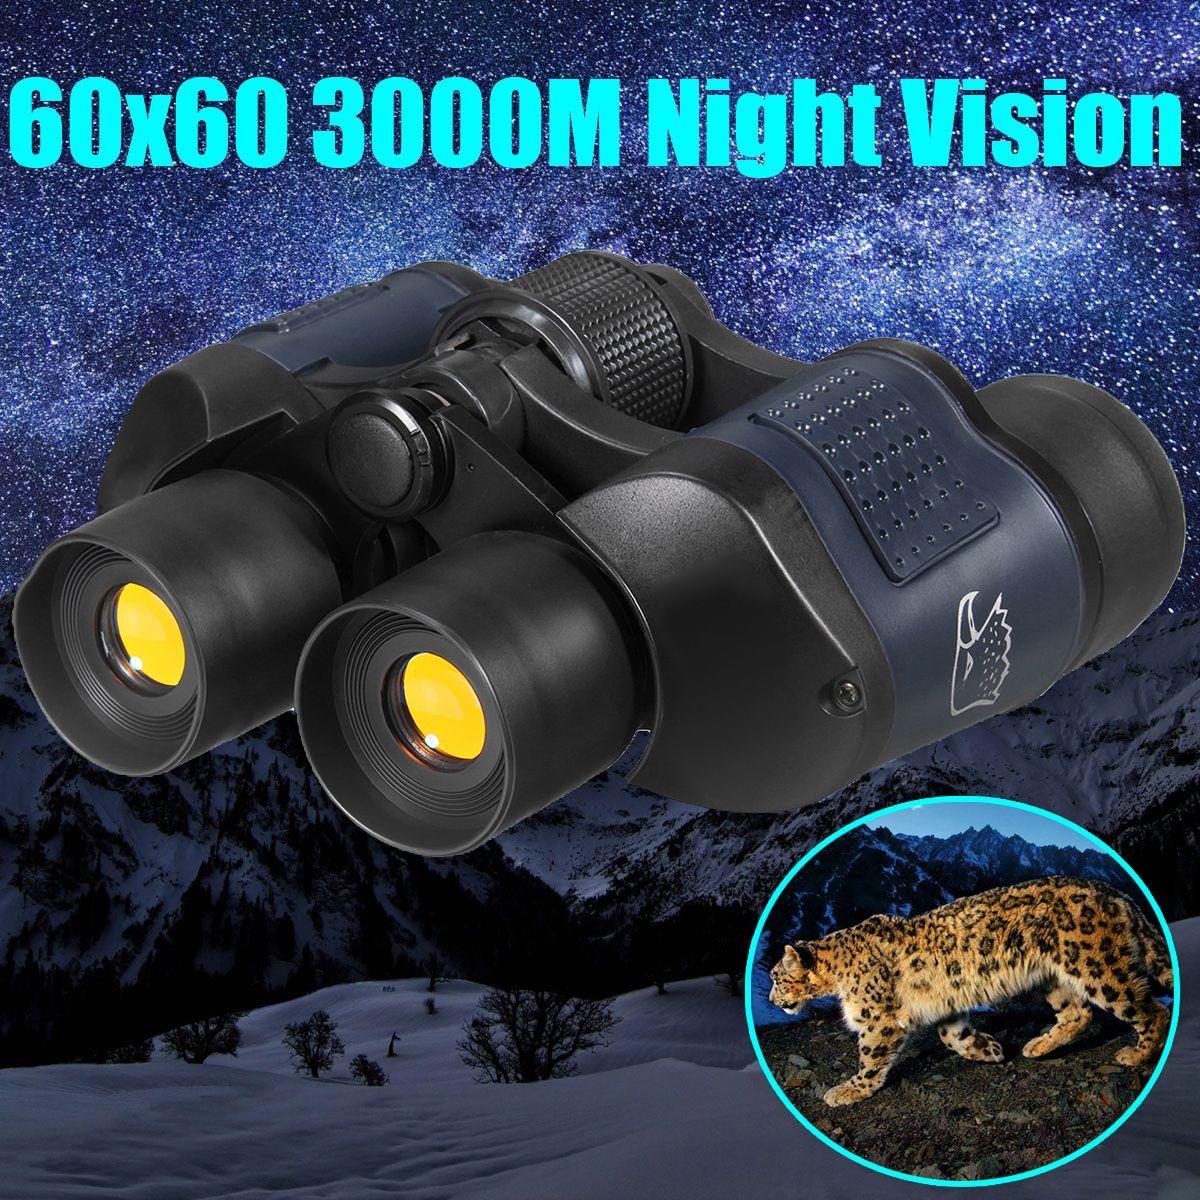 60X60 Optical Telescope Night Vision Binoculars High Clarity 3000M binocular Spotting scope outdoor Hunting sports eyepiece